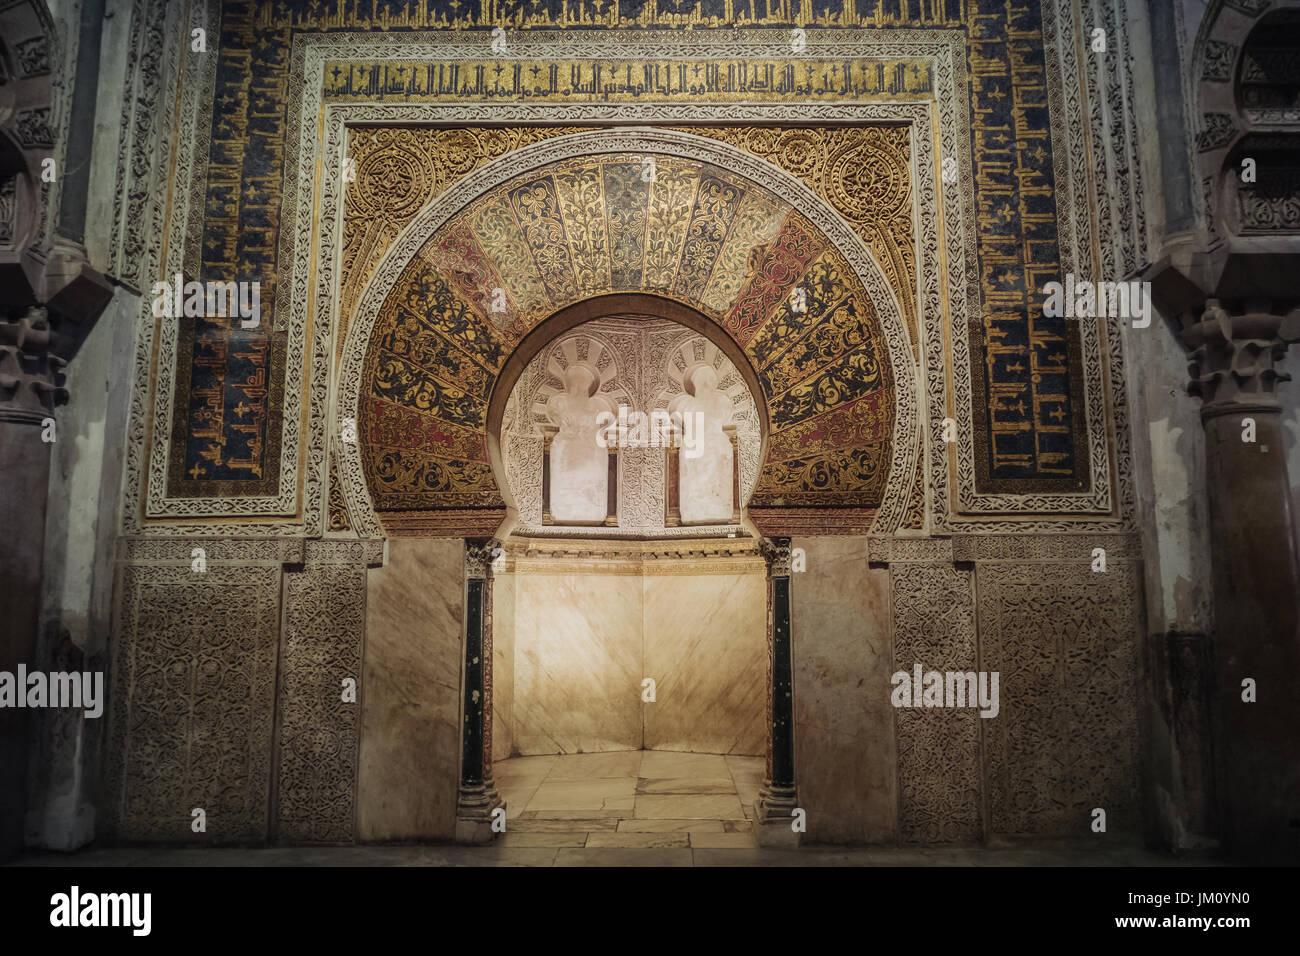 Wonderful moorish architecture in Cordoba, Andalusia, Spain - Stock Image